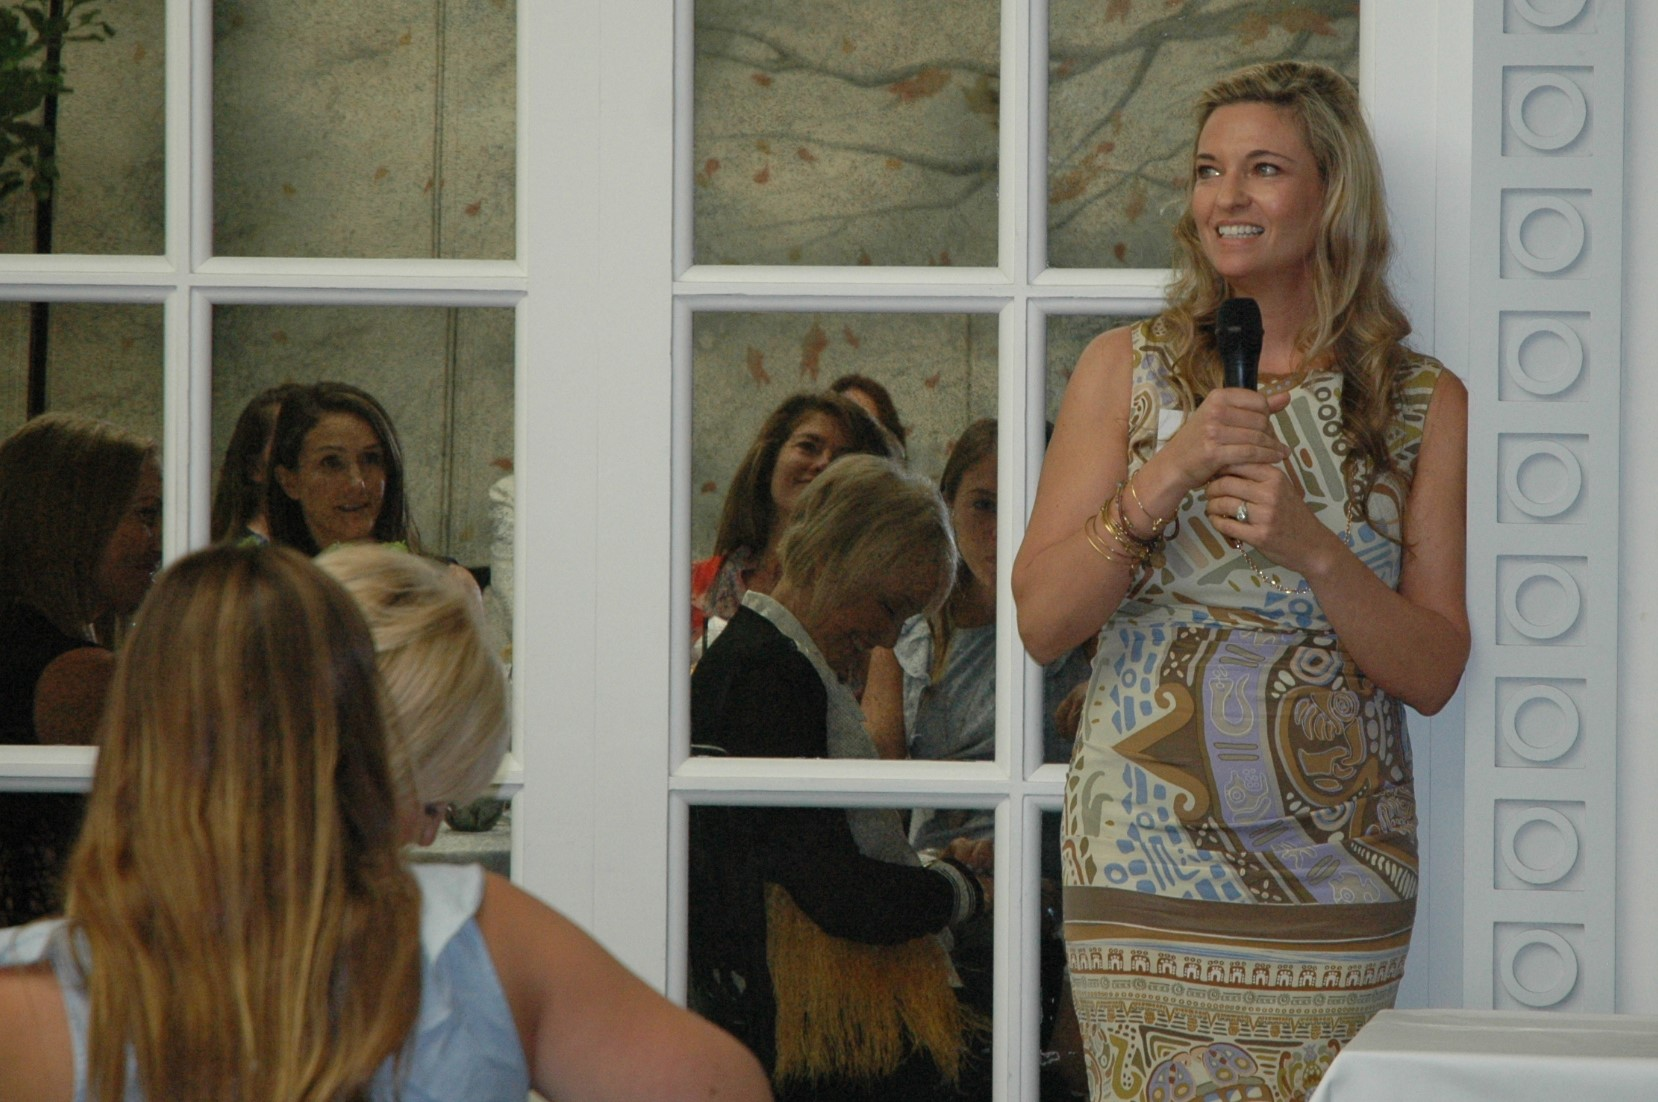 Sept 2017 - Dr. Kristi Funk, Founder of Pink Lotus Breast Center